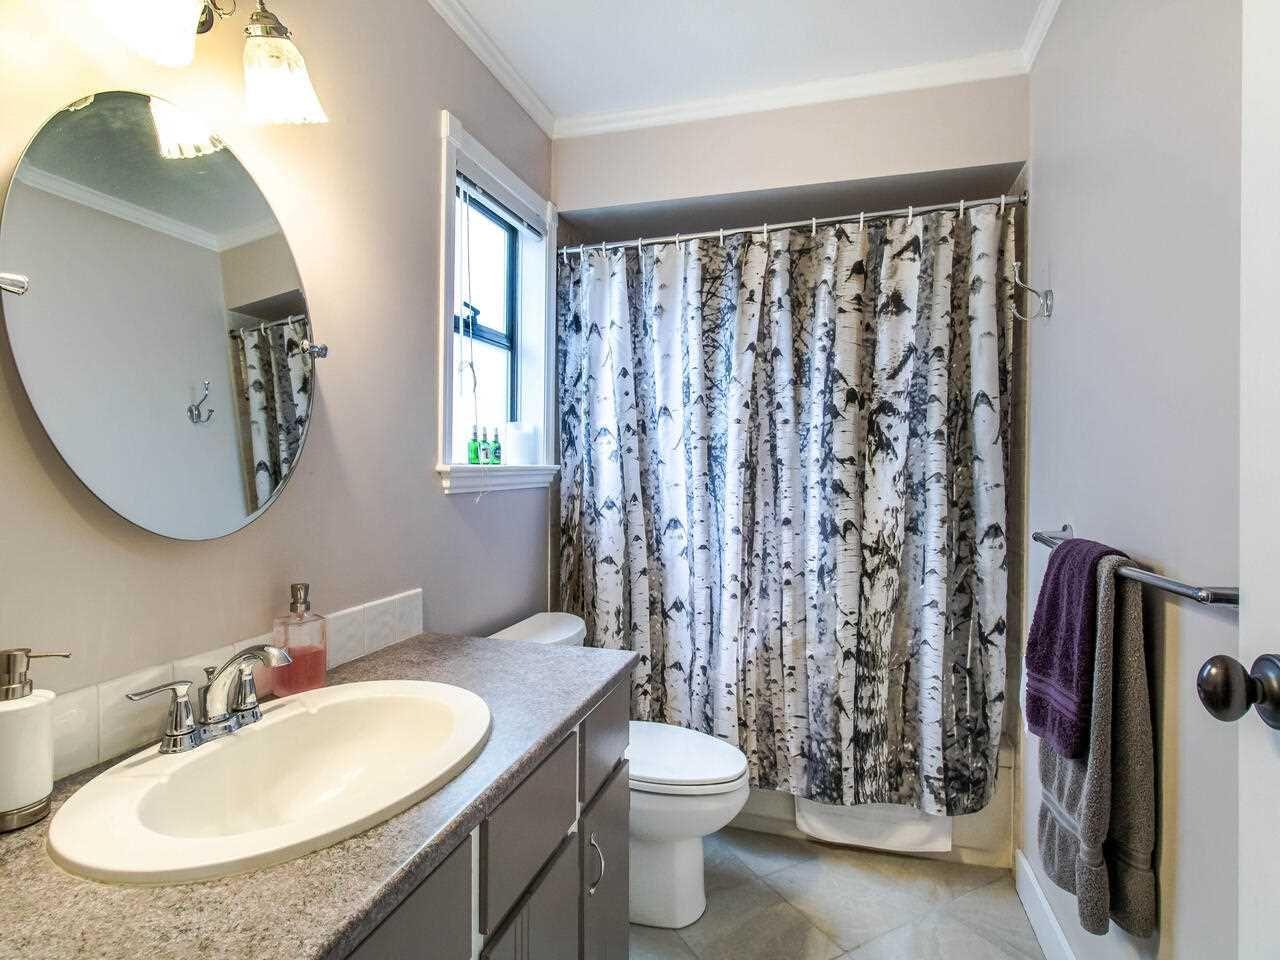 Photo 10: Photos: 11505 PEMBERTON Crescent in Delta: Annieville House for sale (N. Delta)  : MLS®# R2512135